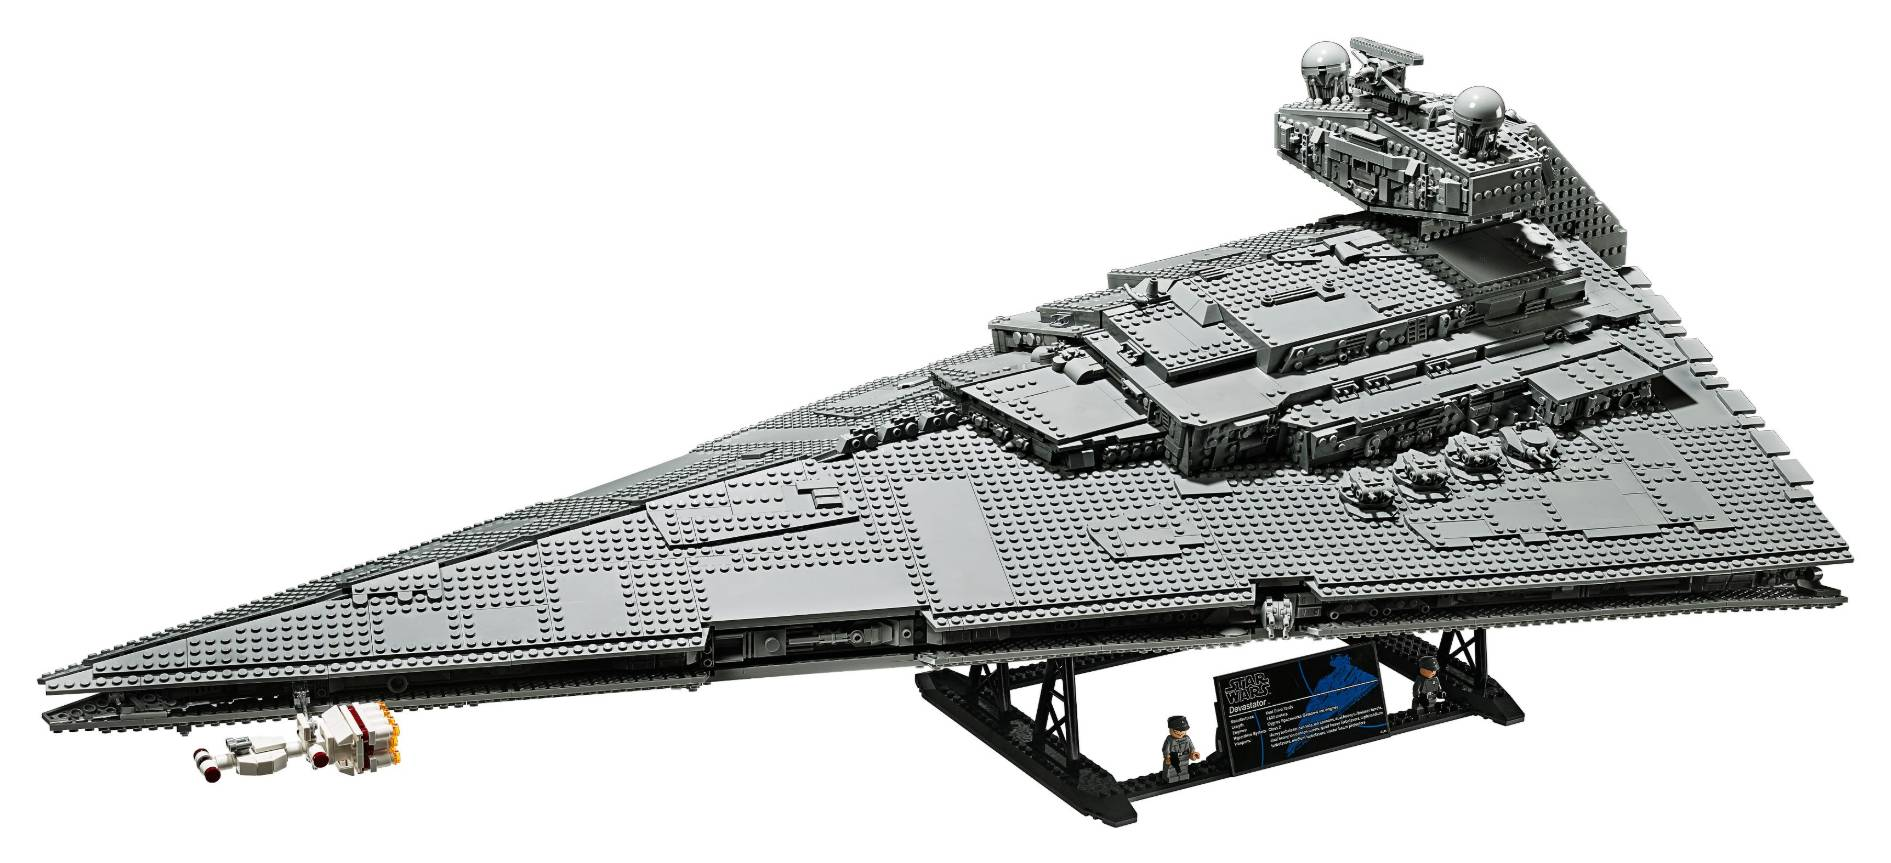 Imperial Star Destoyer